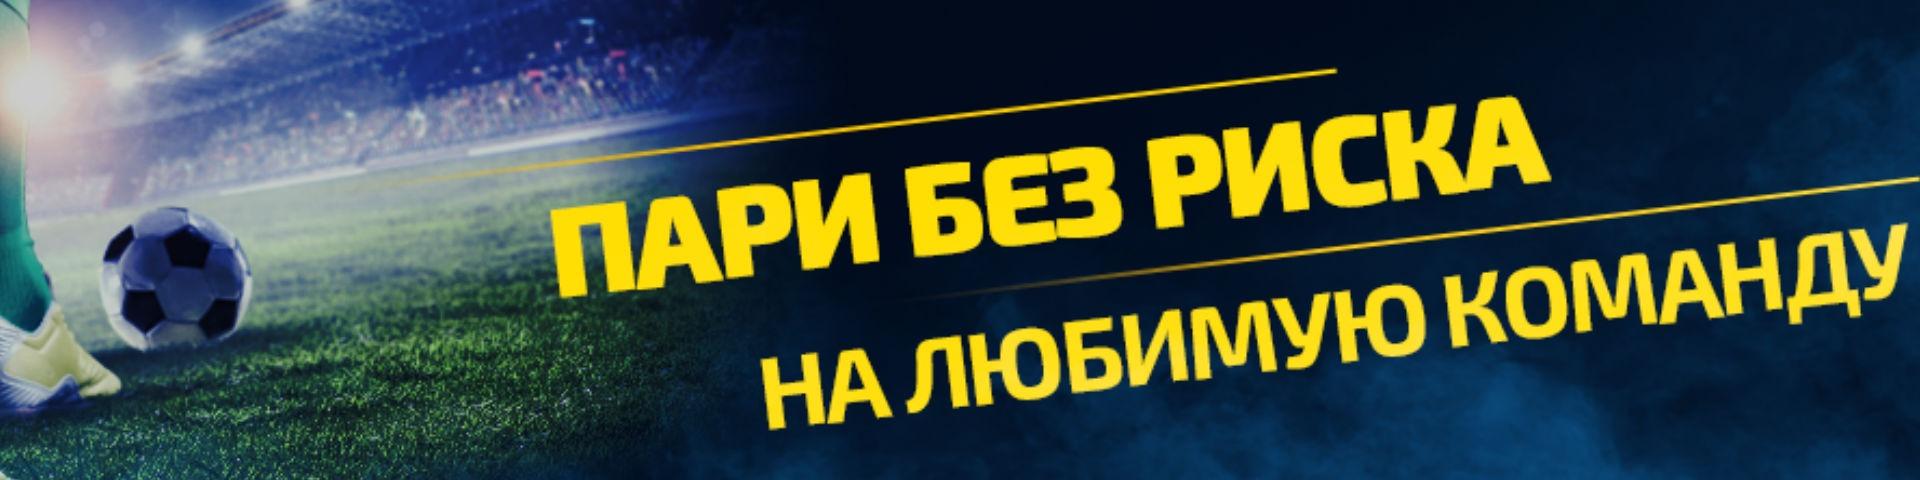 БК GG.BET: страховка ставки на футбол до 700 рублей